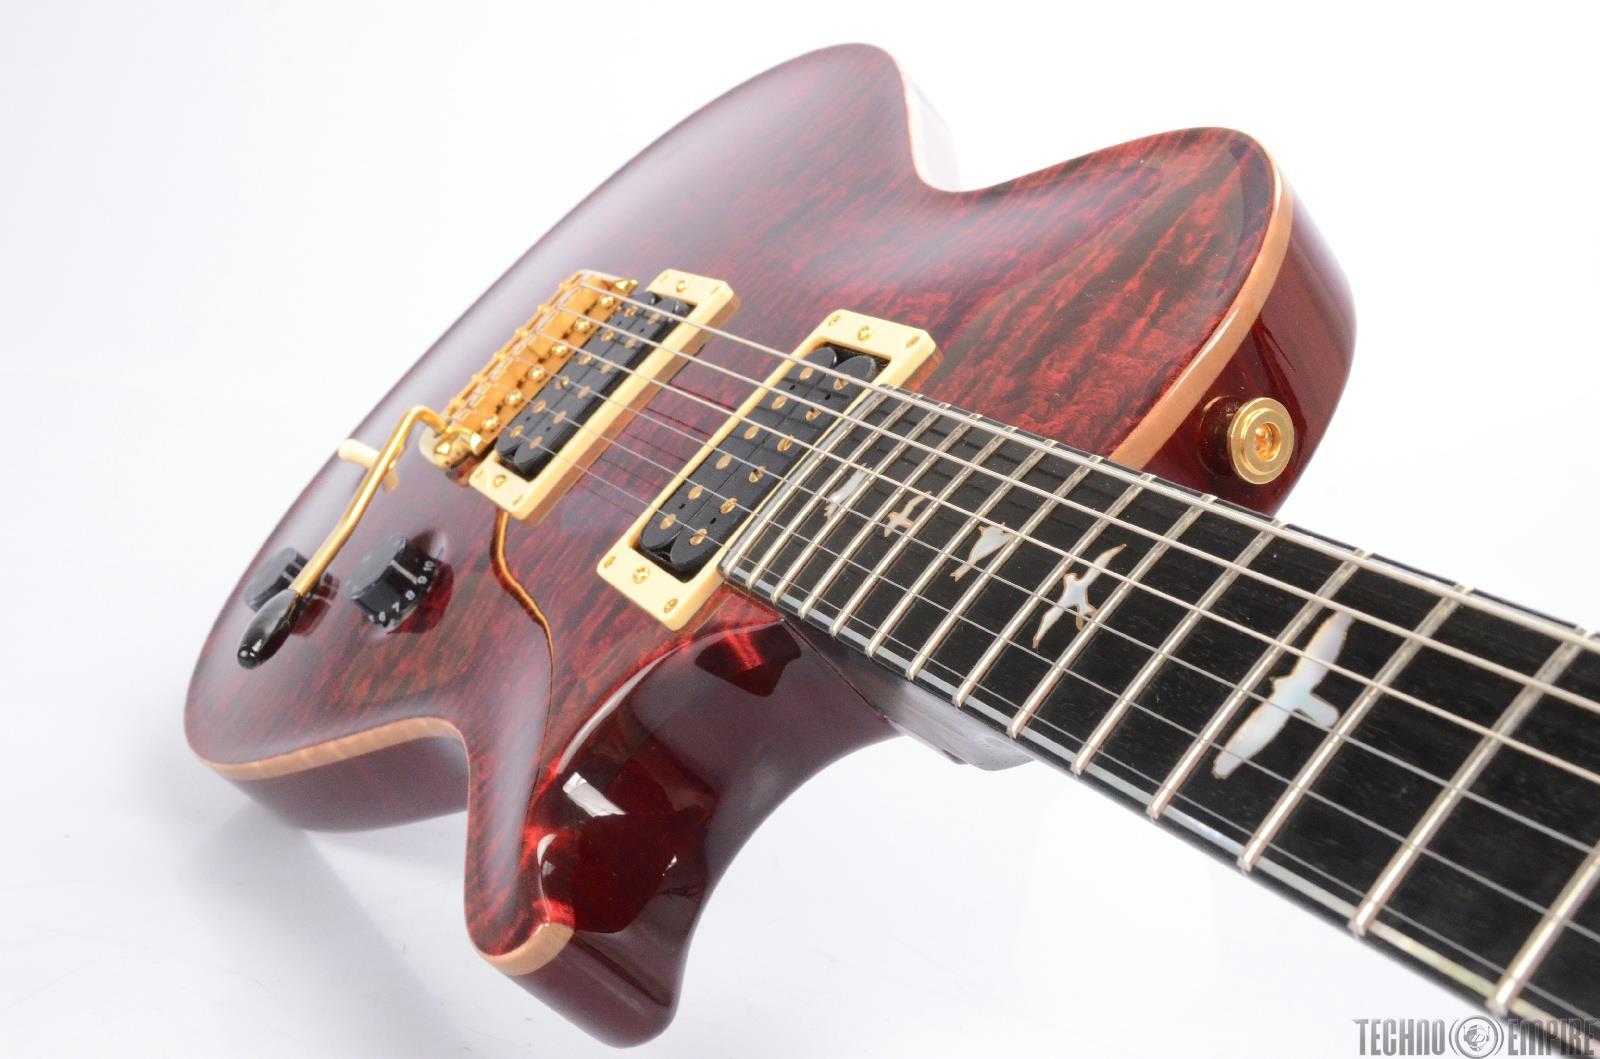 2004 prs private stock 672 sc single cut trem electric guitar w case 24279. Black Bedroom Furniture Sets. Home Design Ideas